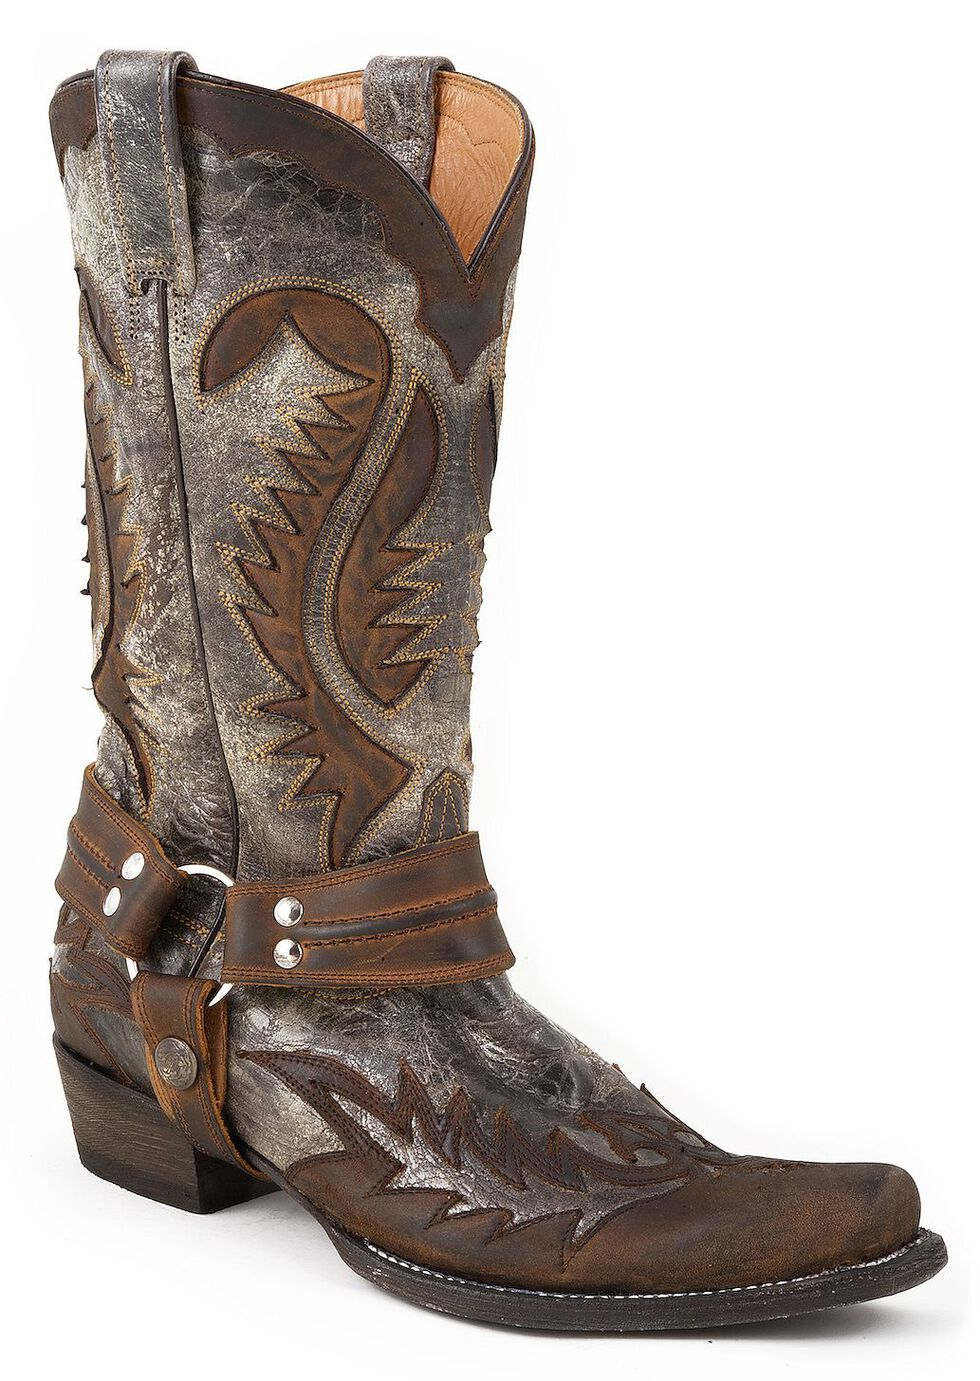 Stetson Crackle Harness Cowboy Boots - Snip Toe, Brown, hi-res